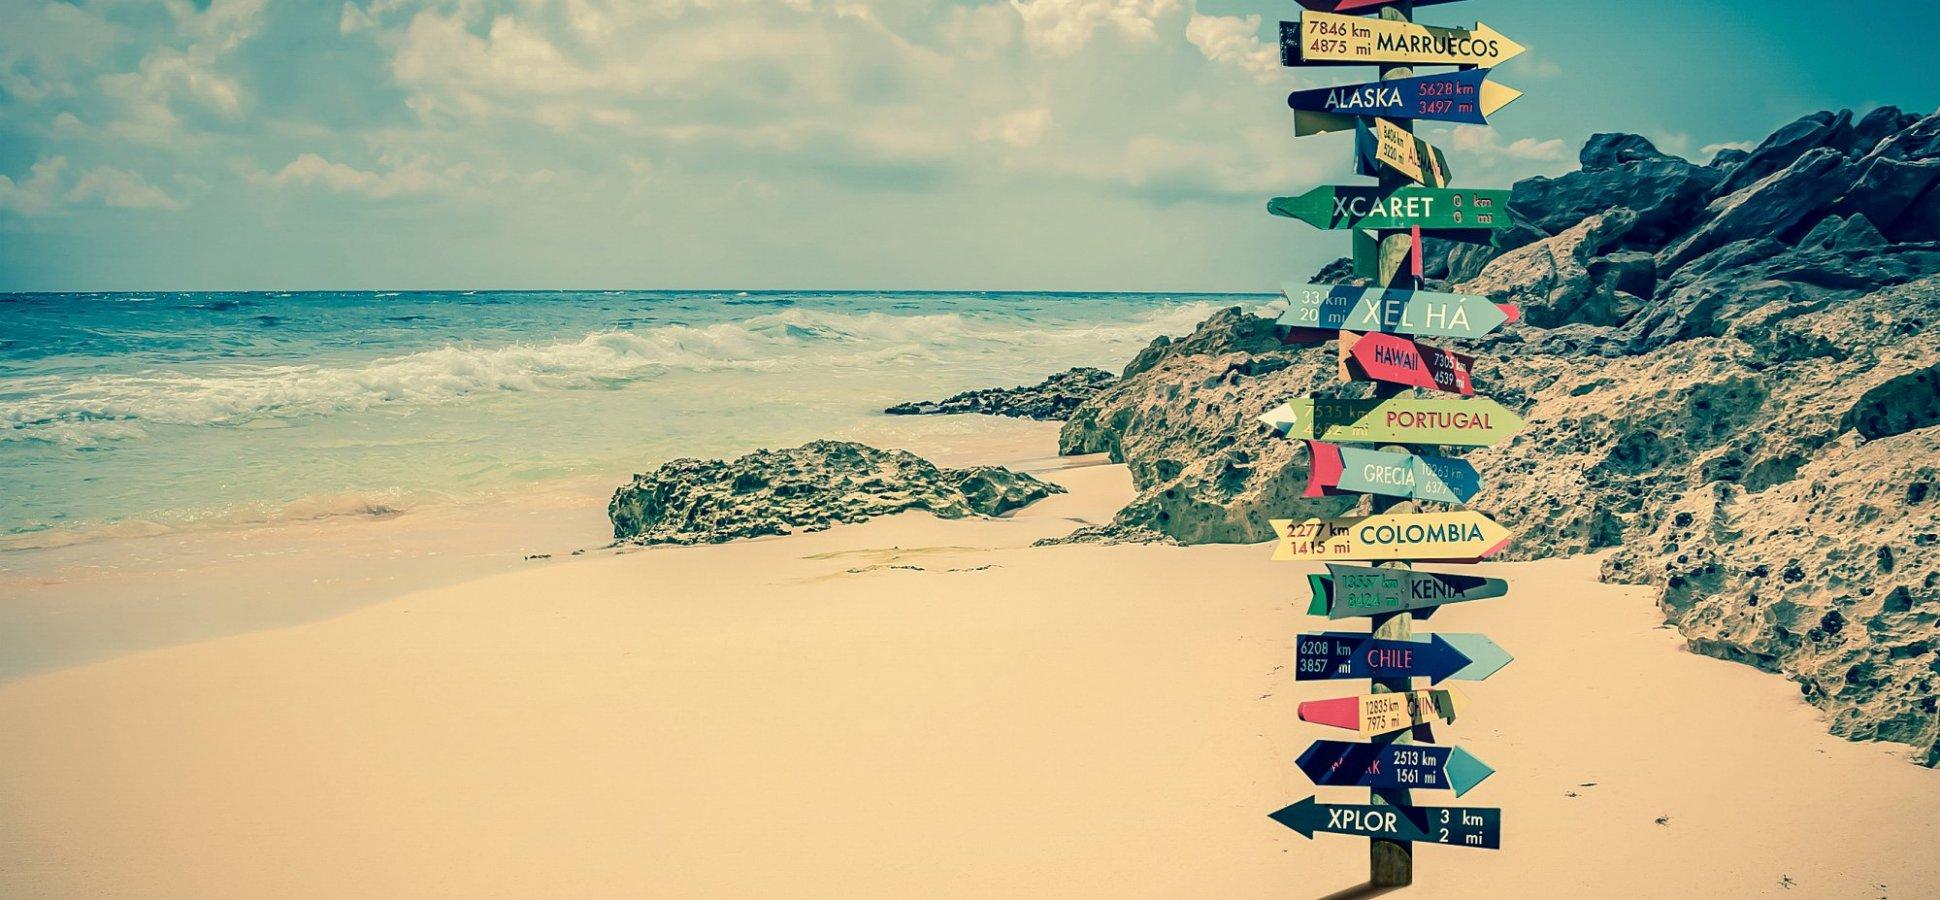 The 5 Best Websites to Find Super Cheap Summer Travel Deals